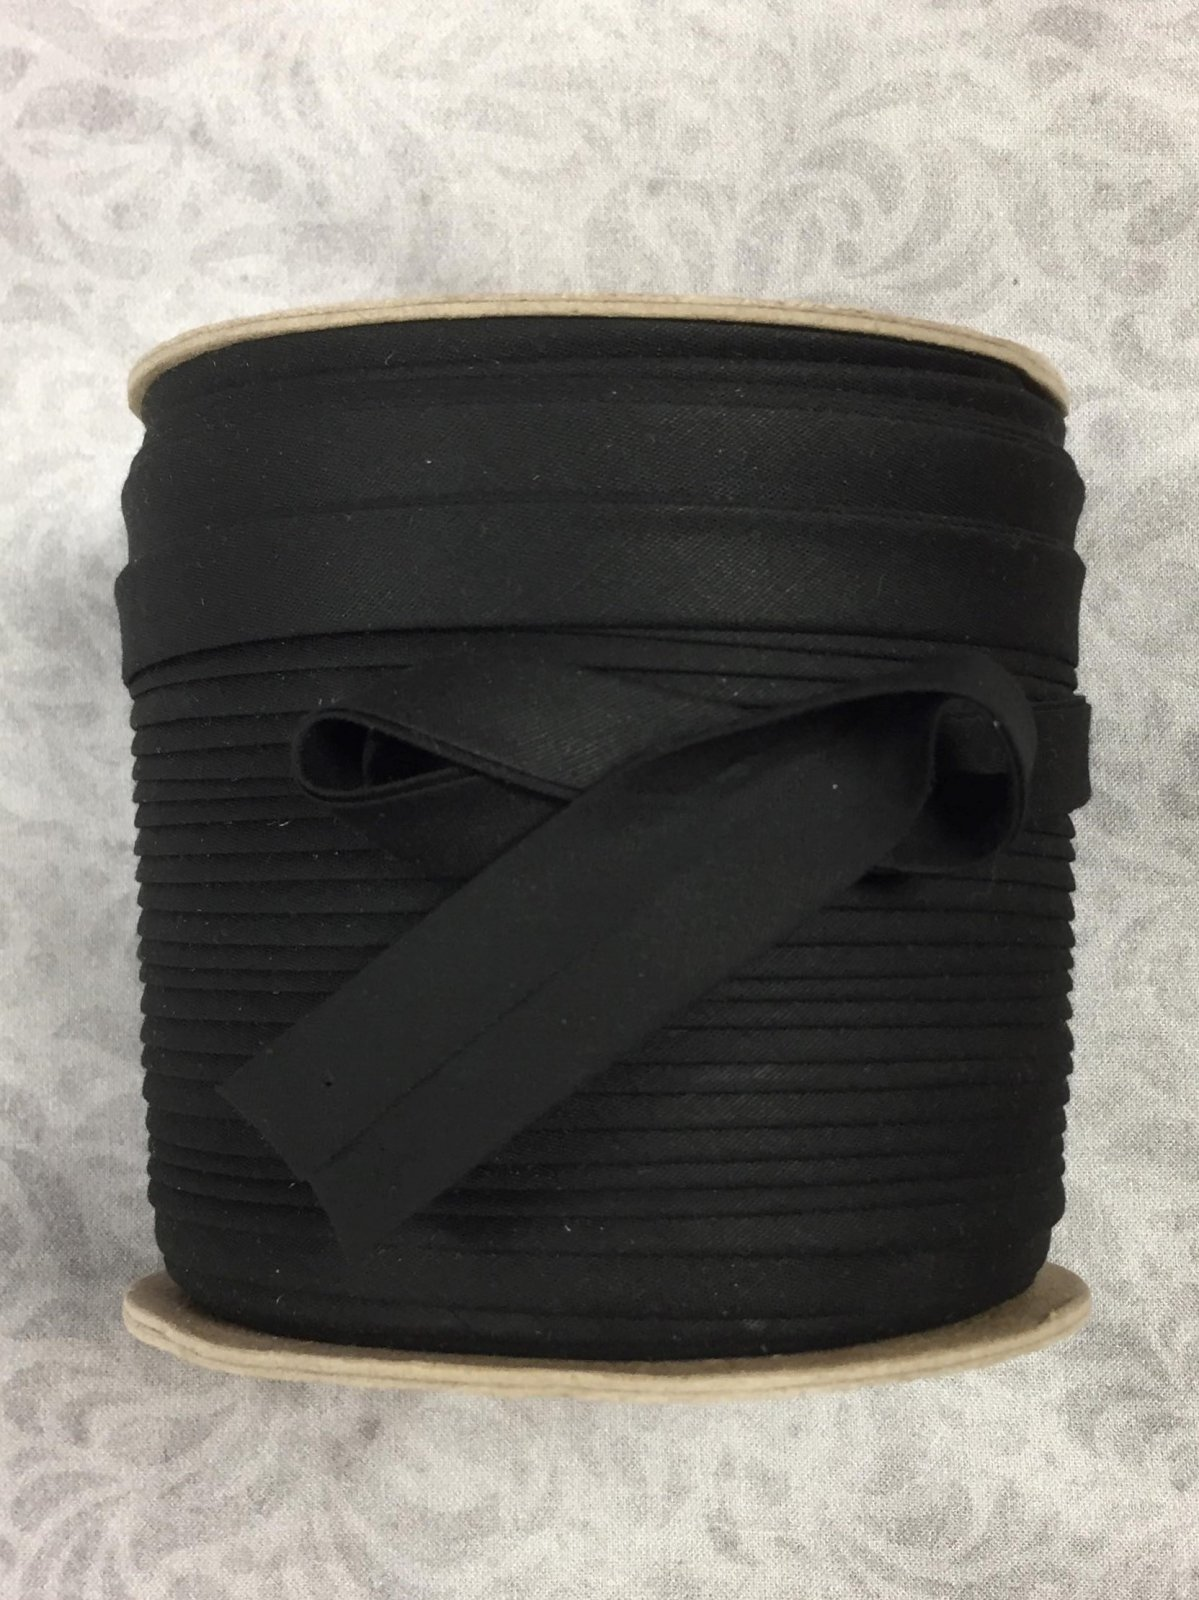 High Quality 1/2 Double Fold Bias Binding 10yd Cut -Black